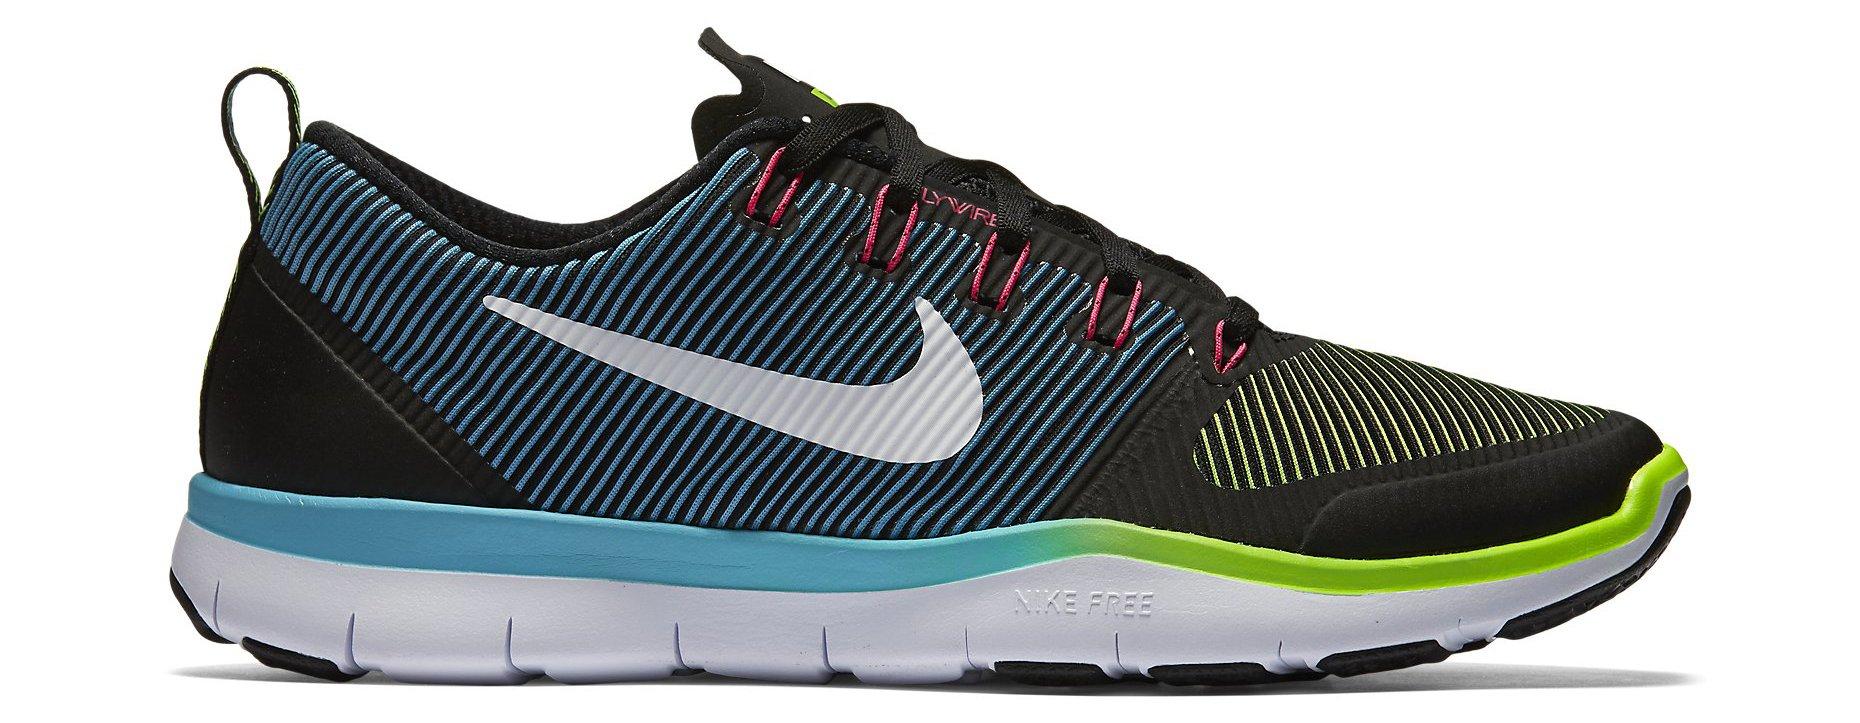 Shoes Nike FREE TRAIN VERSATILITY